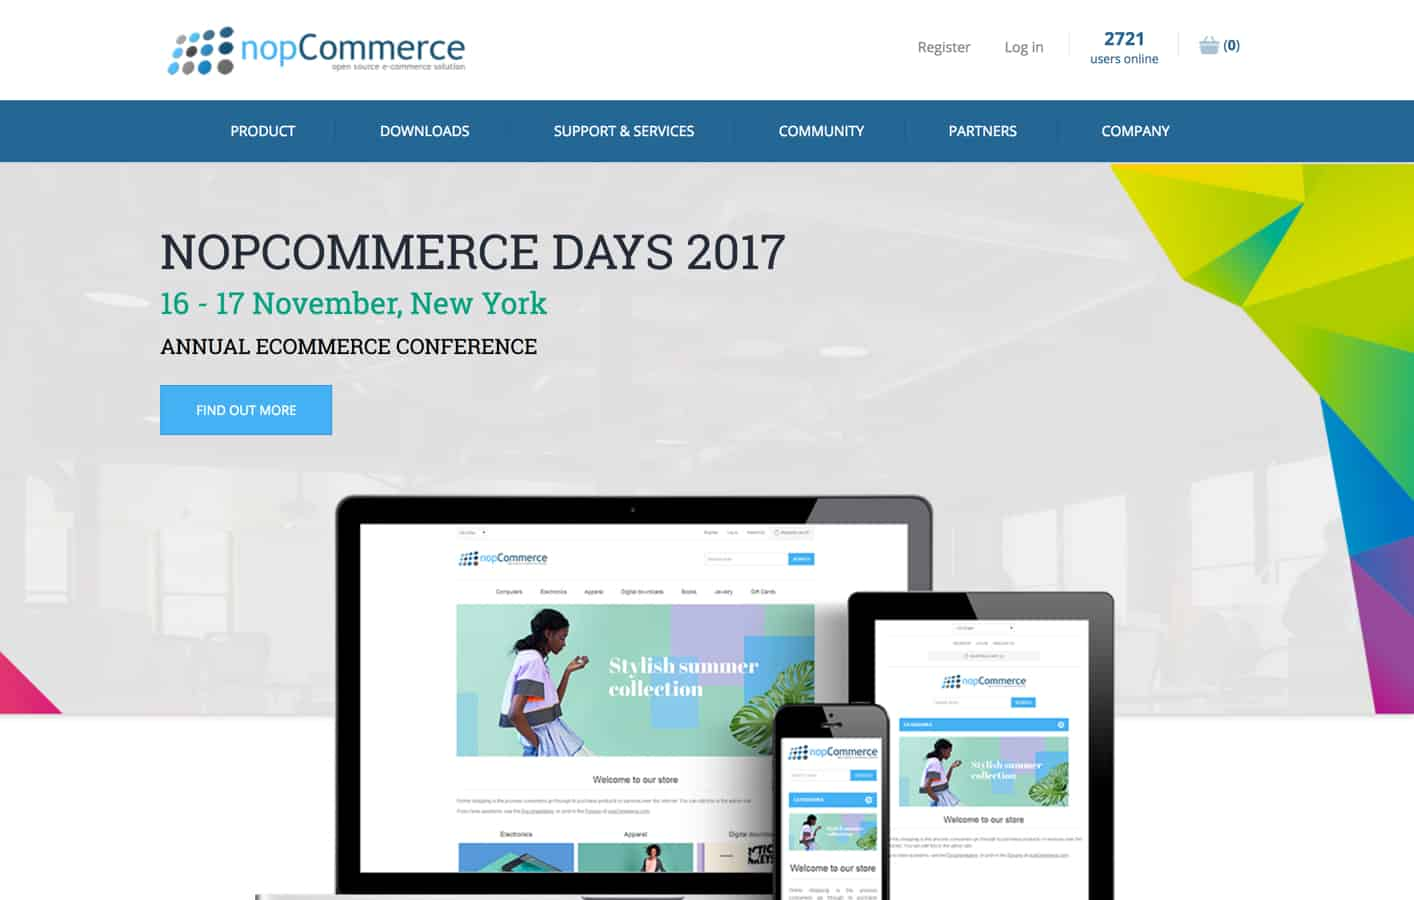 nopCommerce review